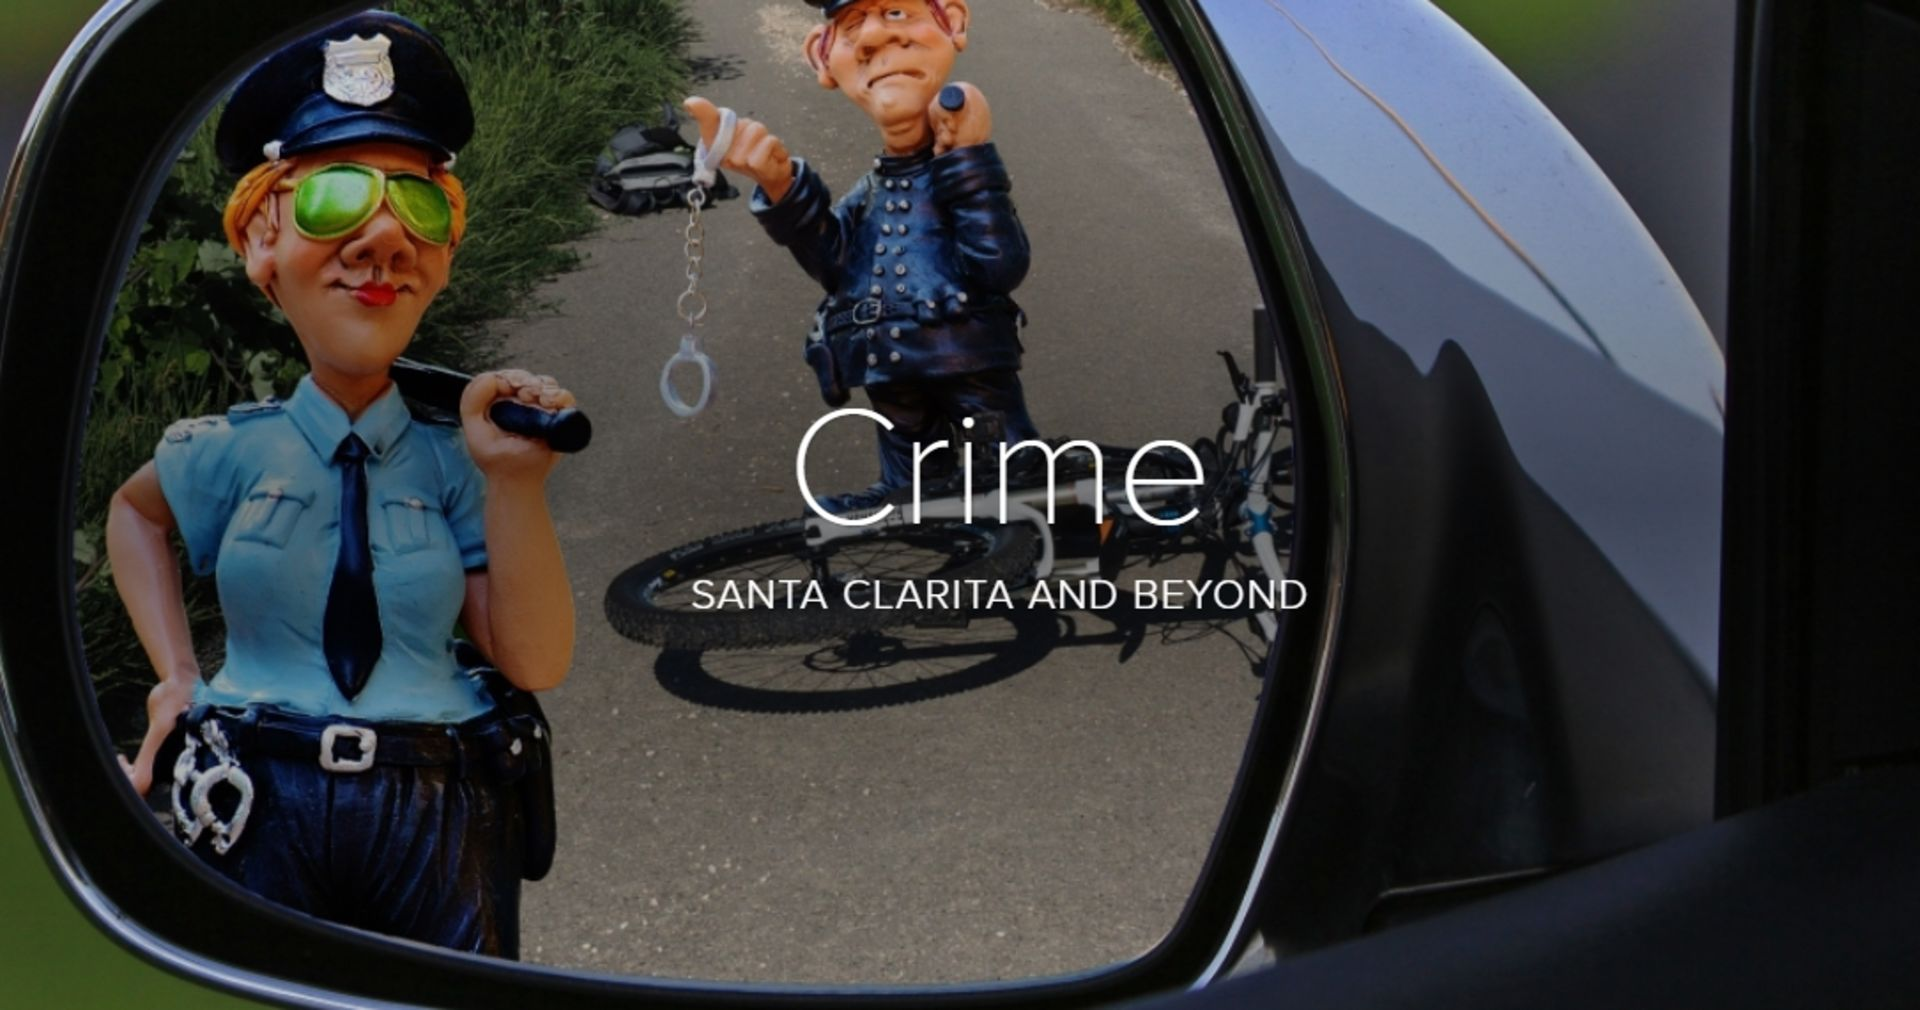 Crime: Santa Clarita Drops 3 Spots in 2017 Rankings